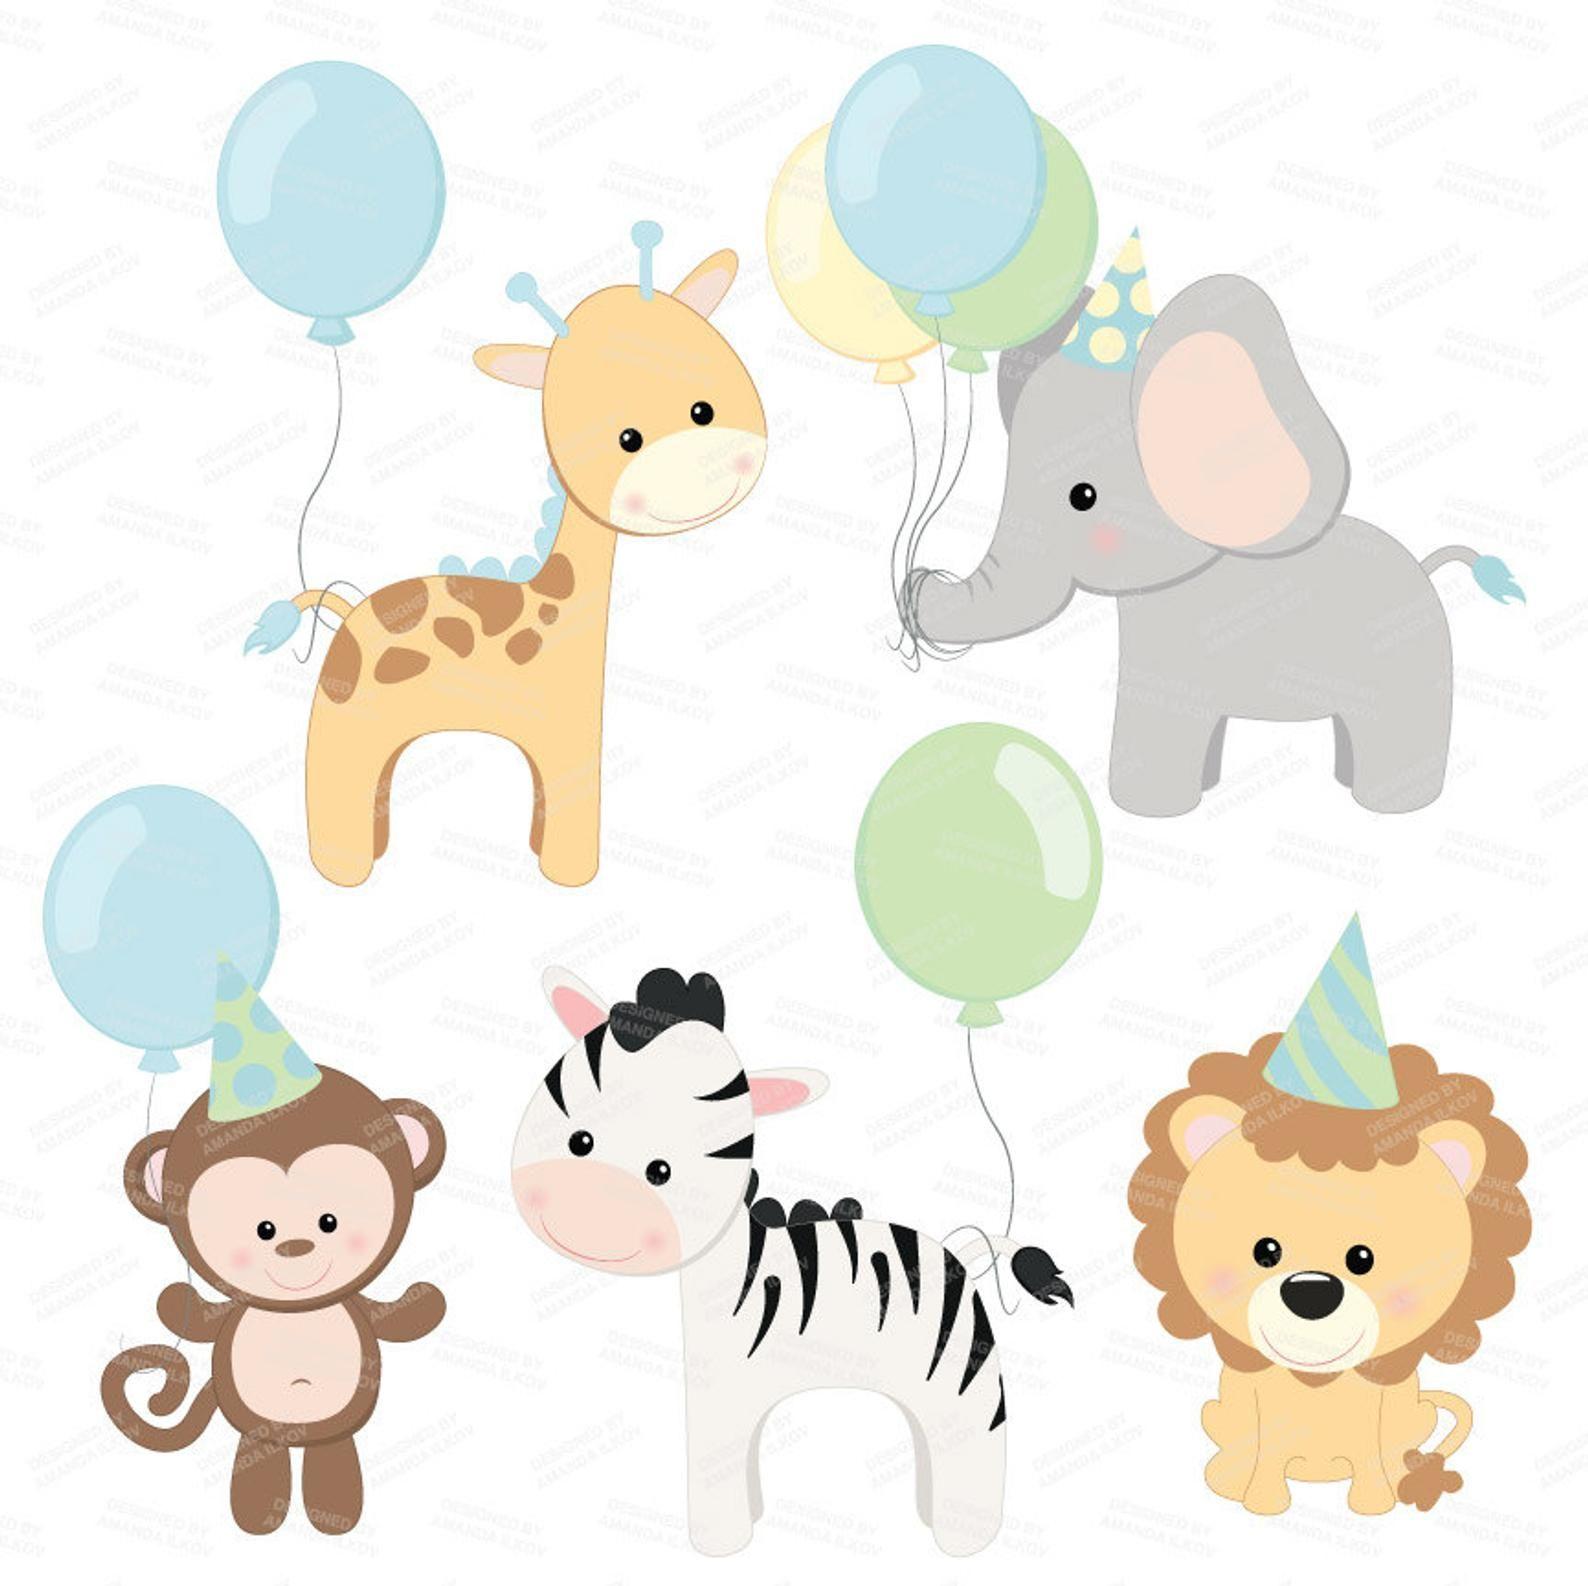 Professional Baby Birthday Party Animals Clipart Vector Set Baby Shower Clip Art Baby Animals Clip Art Birthday Party Clipart Decoracao Arca De Noe Festa Com Tema De Animais Decoracao